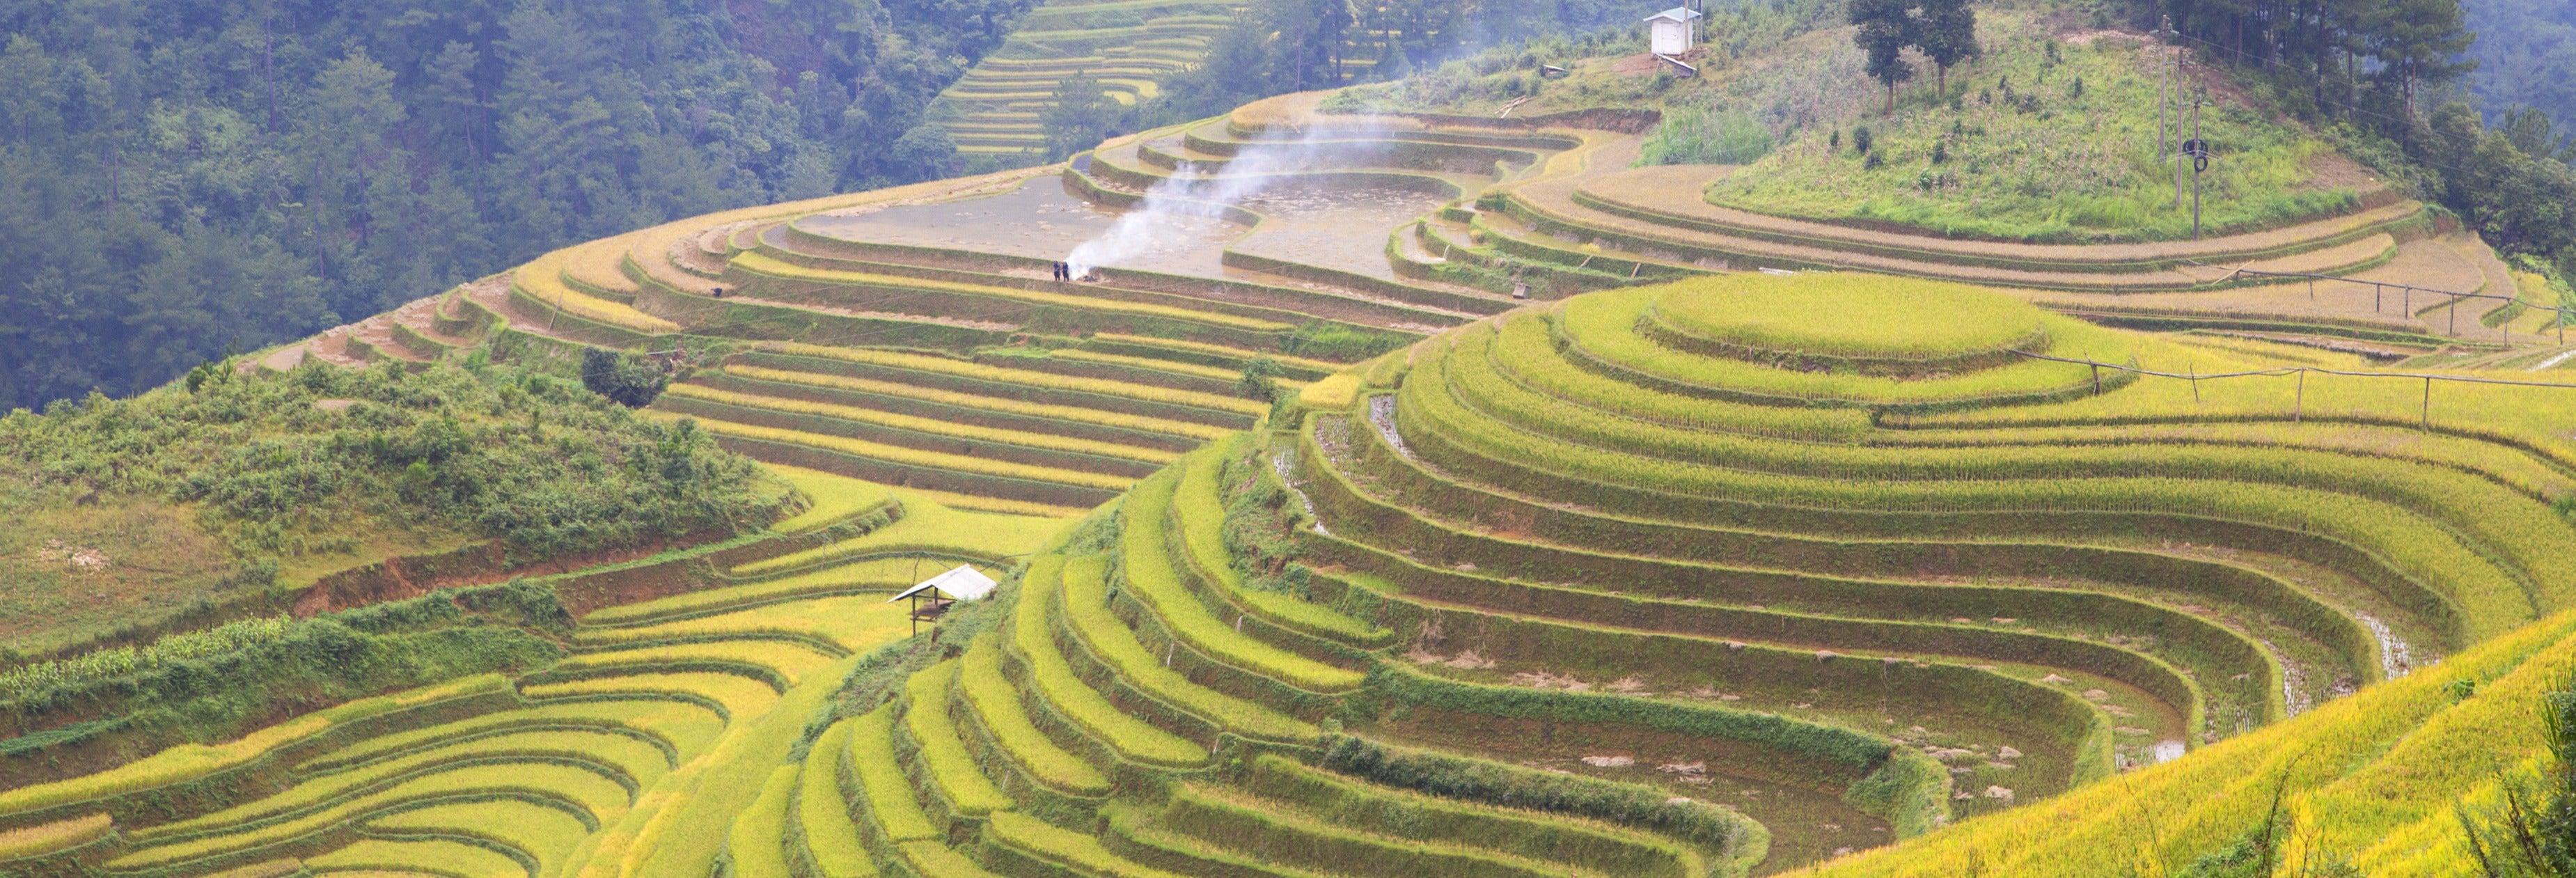 Bike Tour of Bali Rice Terraces